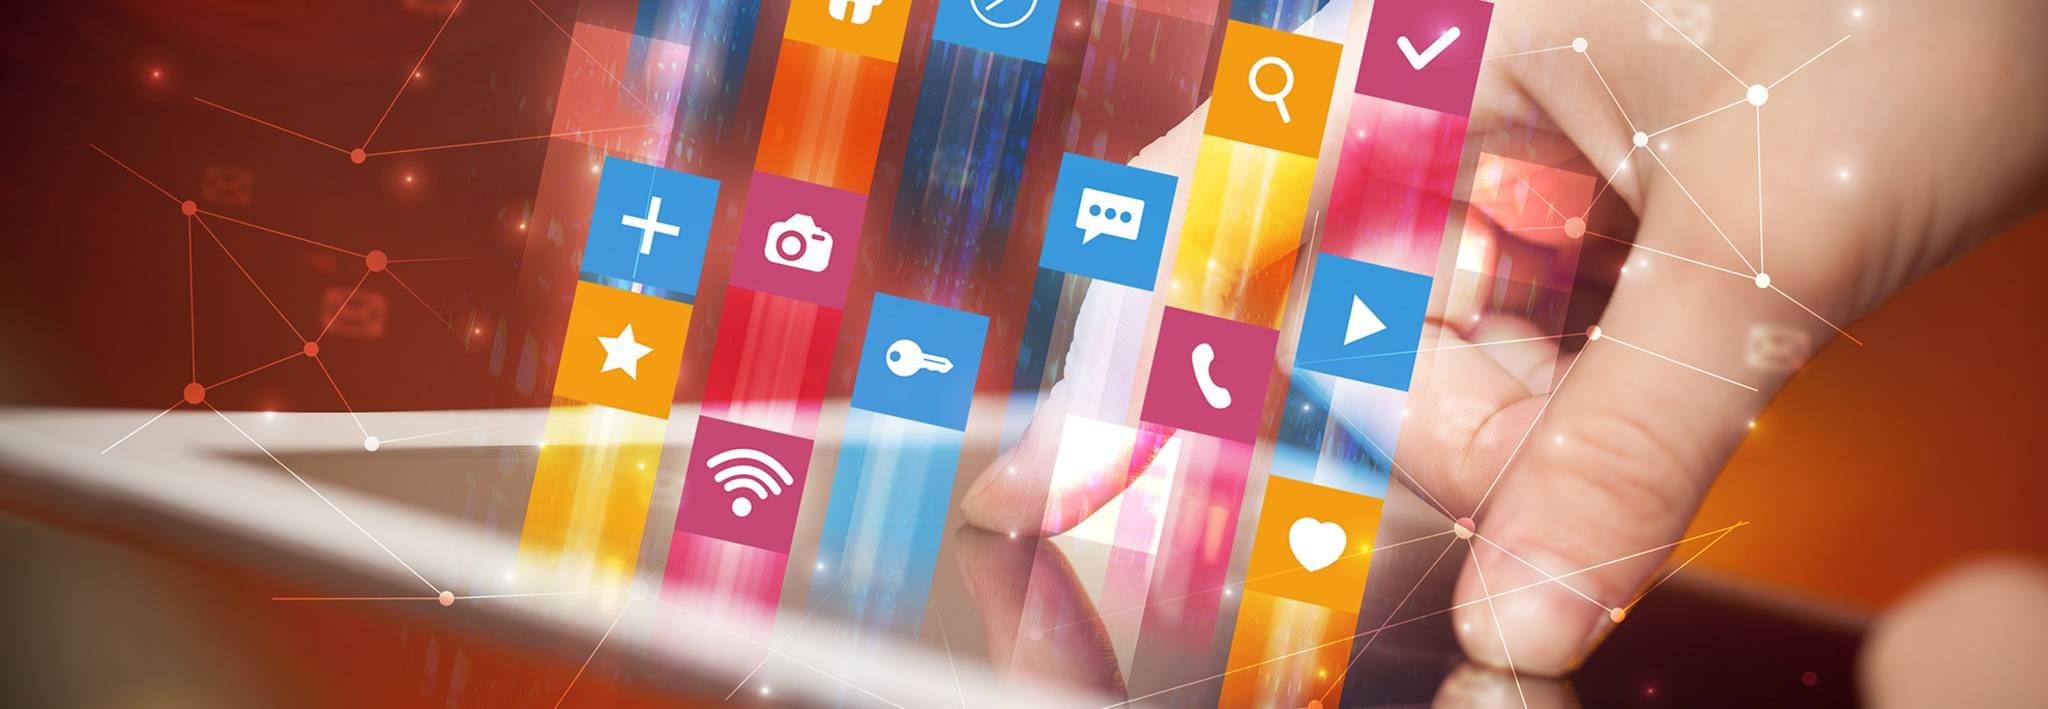 Digital media icons.